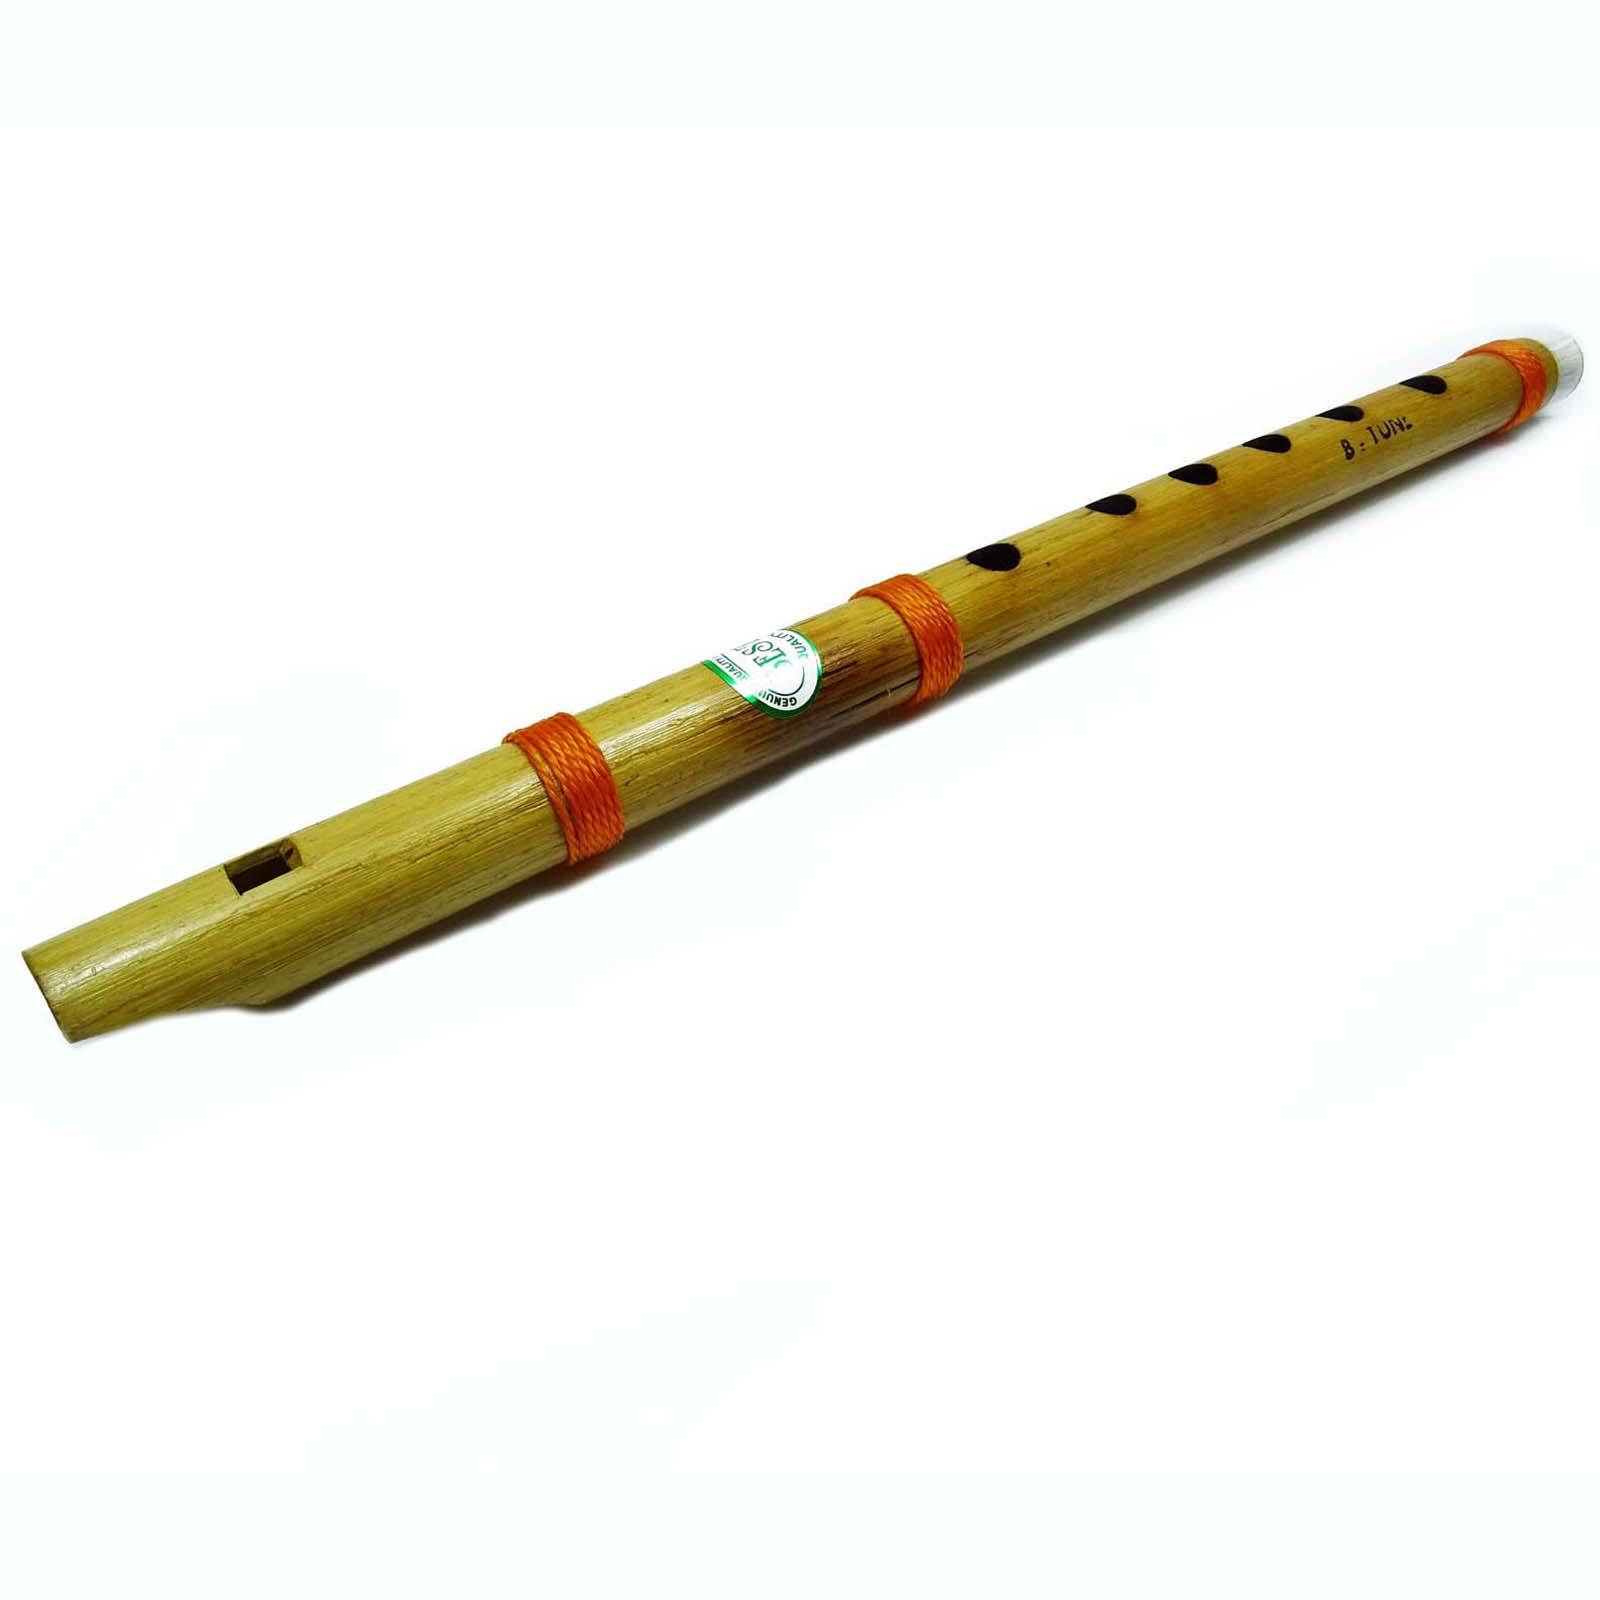 Decorative Brown Musical Instrument Wooden Bansuri Hand Painted ...